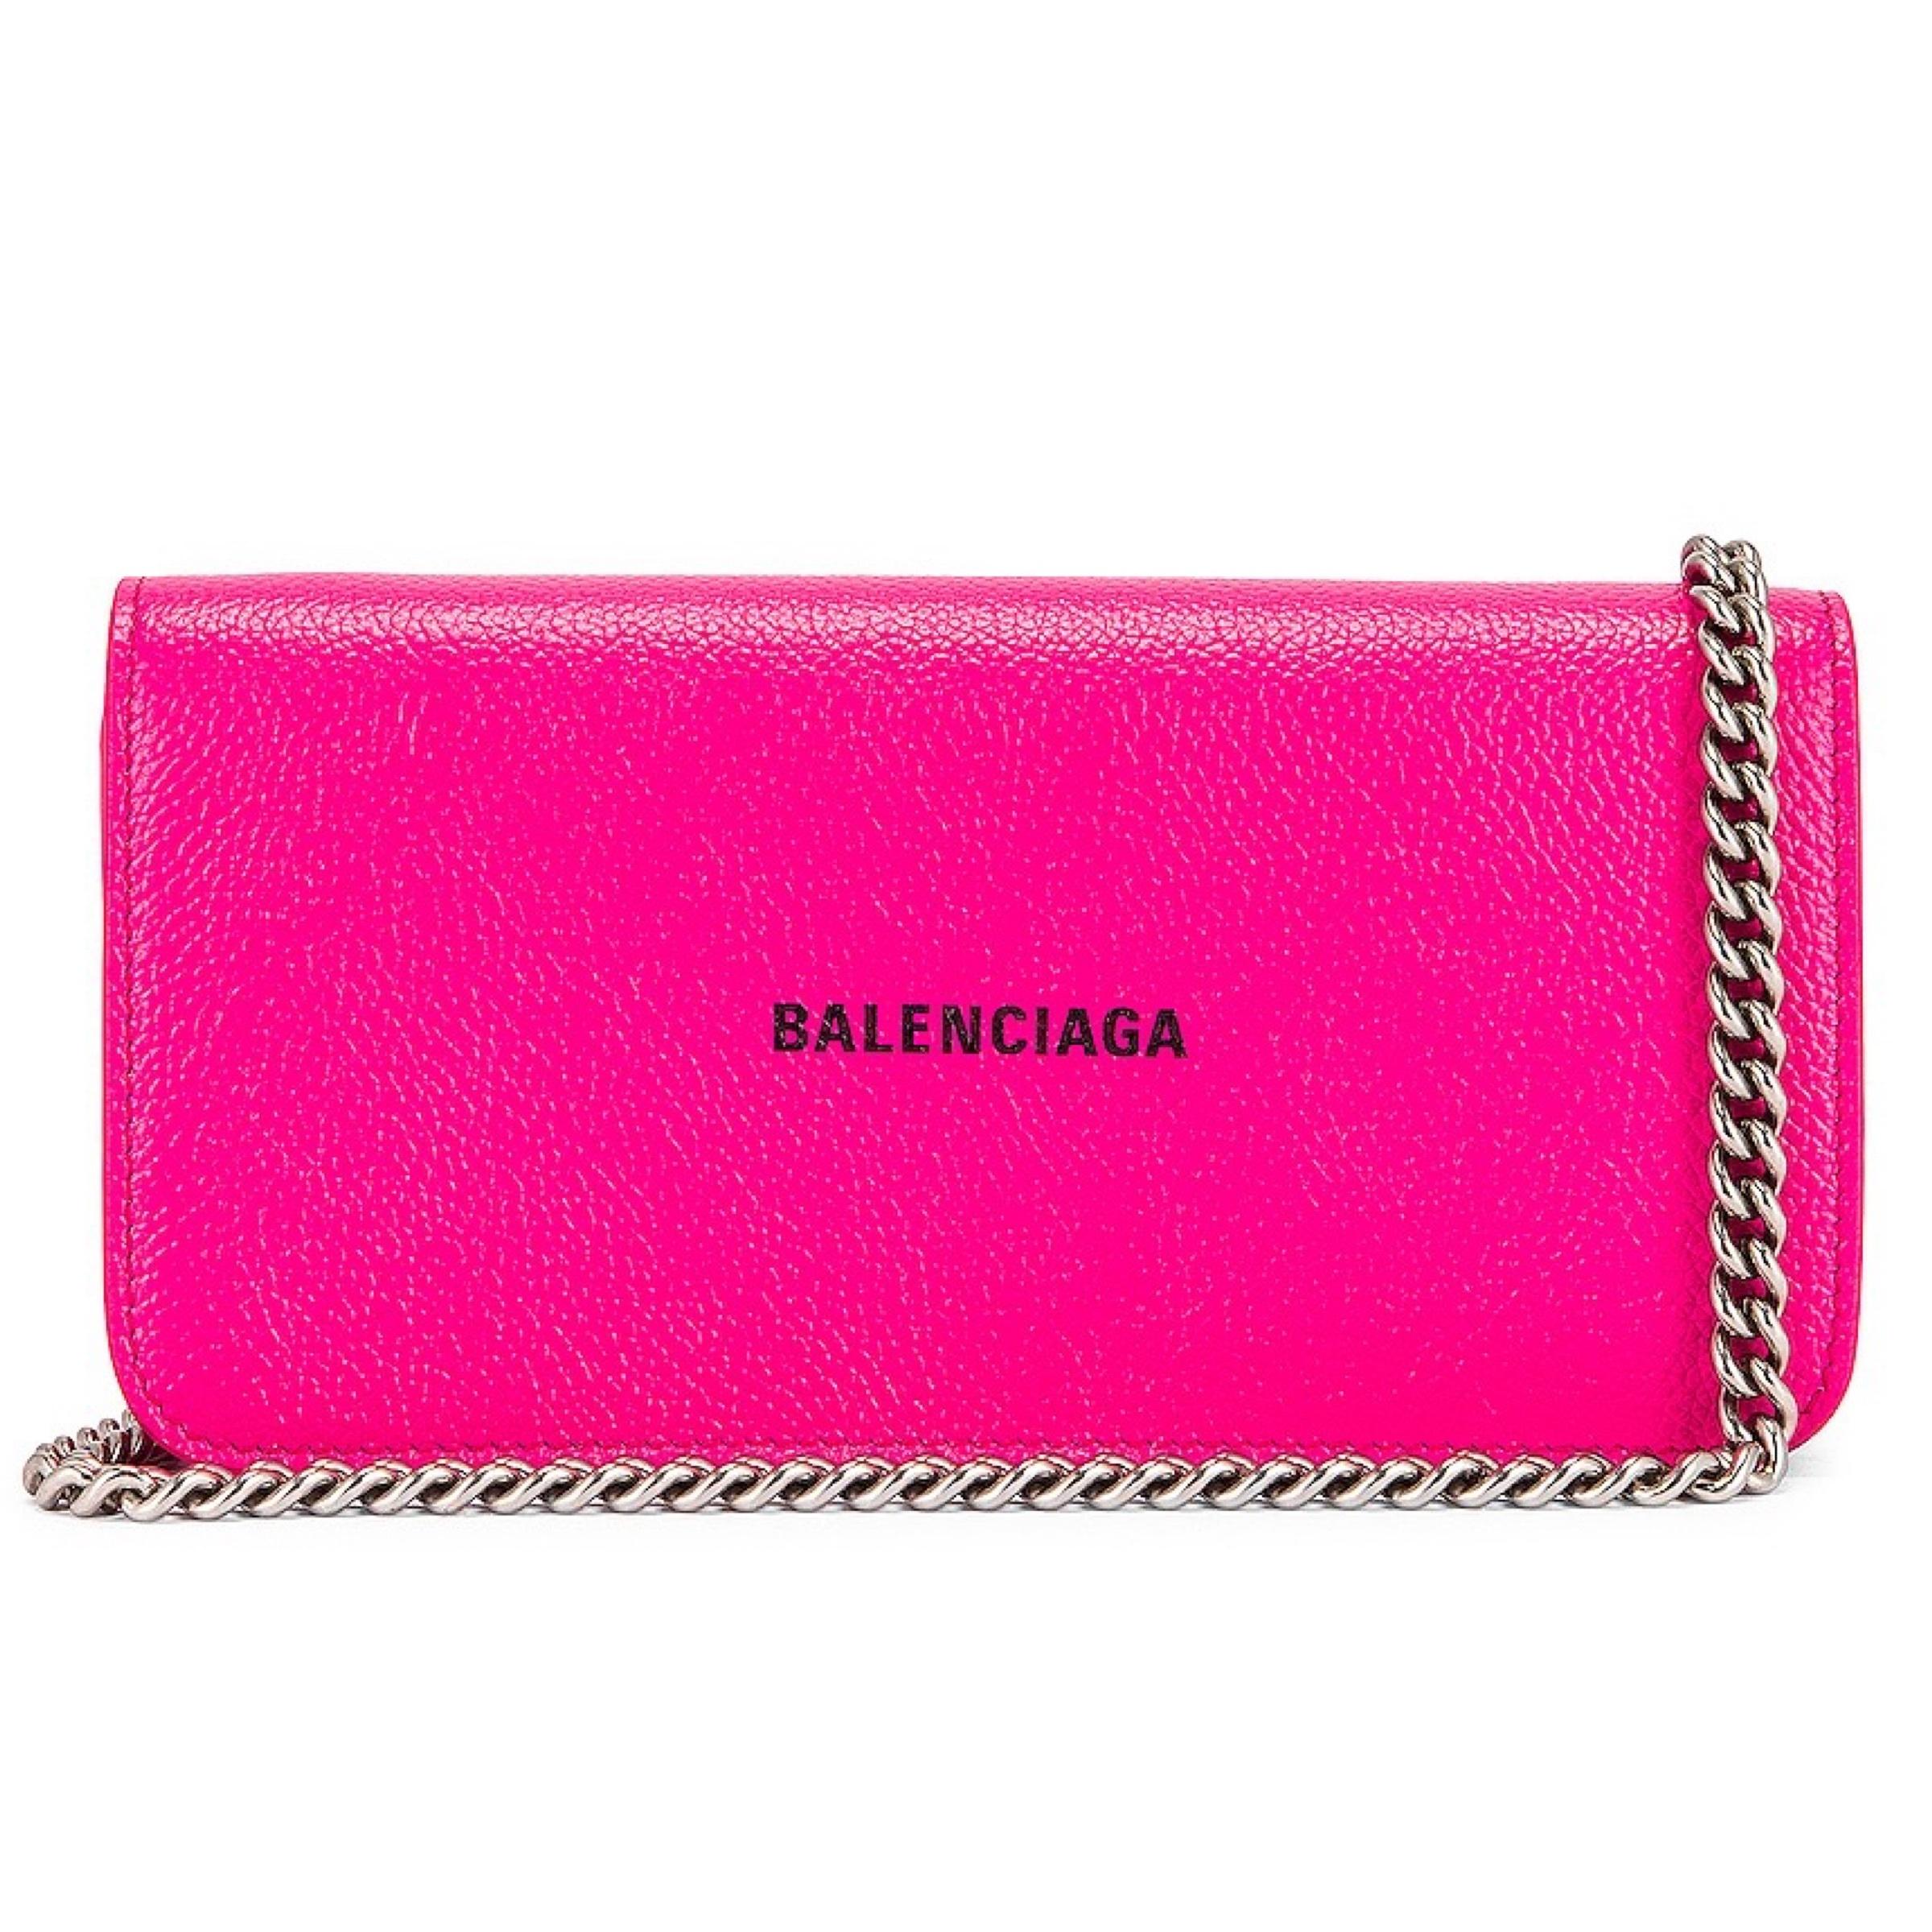 BALENCIAGA NEW Balenciaga Pink Cash Continental Chain Bag Crossbody Bag